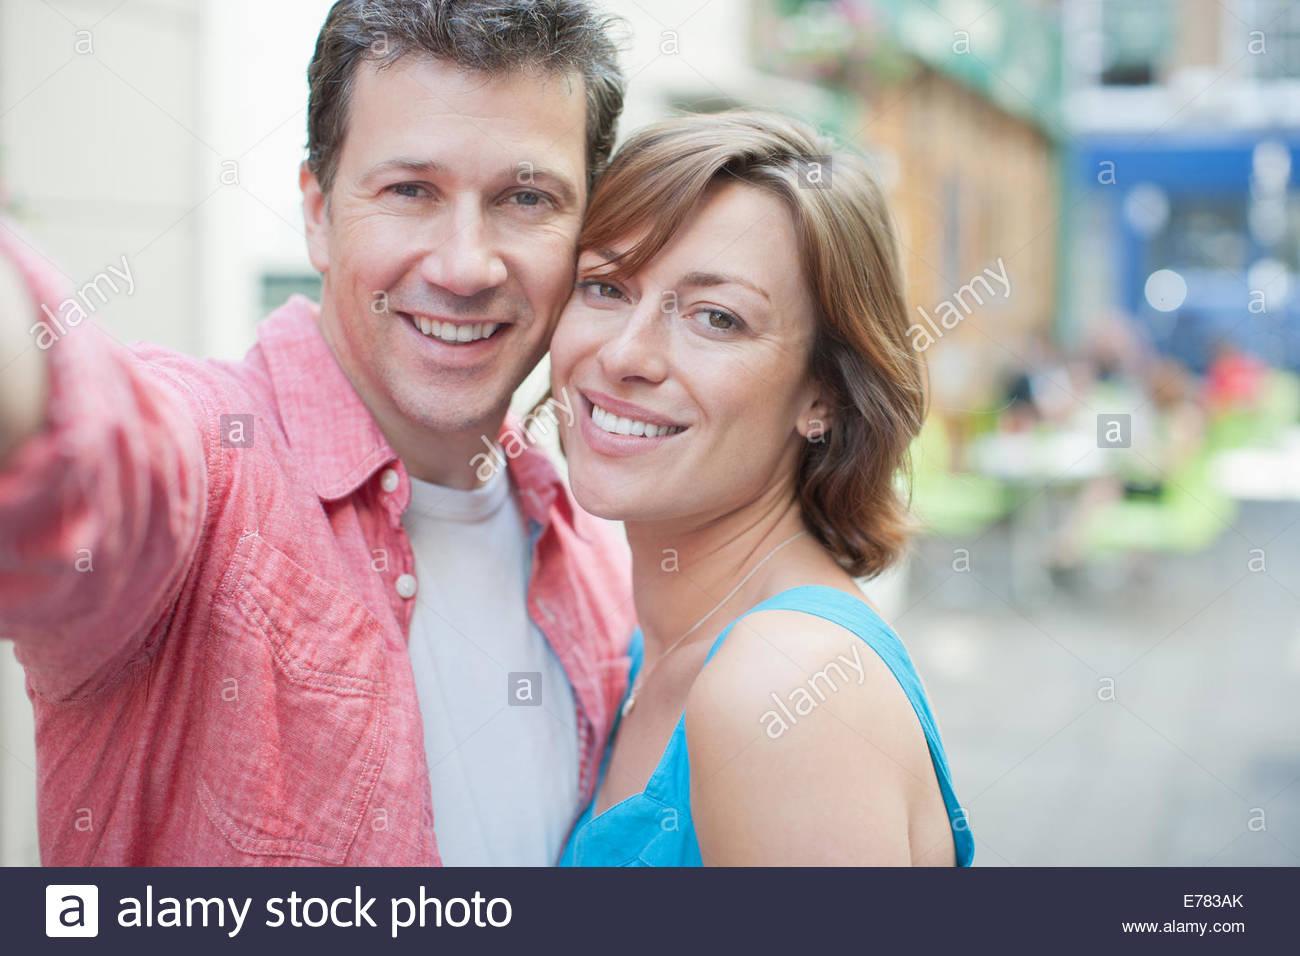 Pareja juguetona sonriendo al aire libre Imagen De Stock